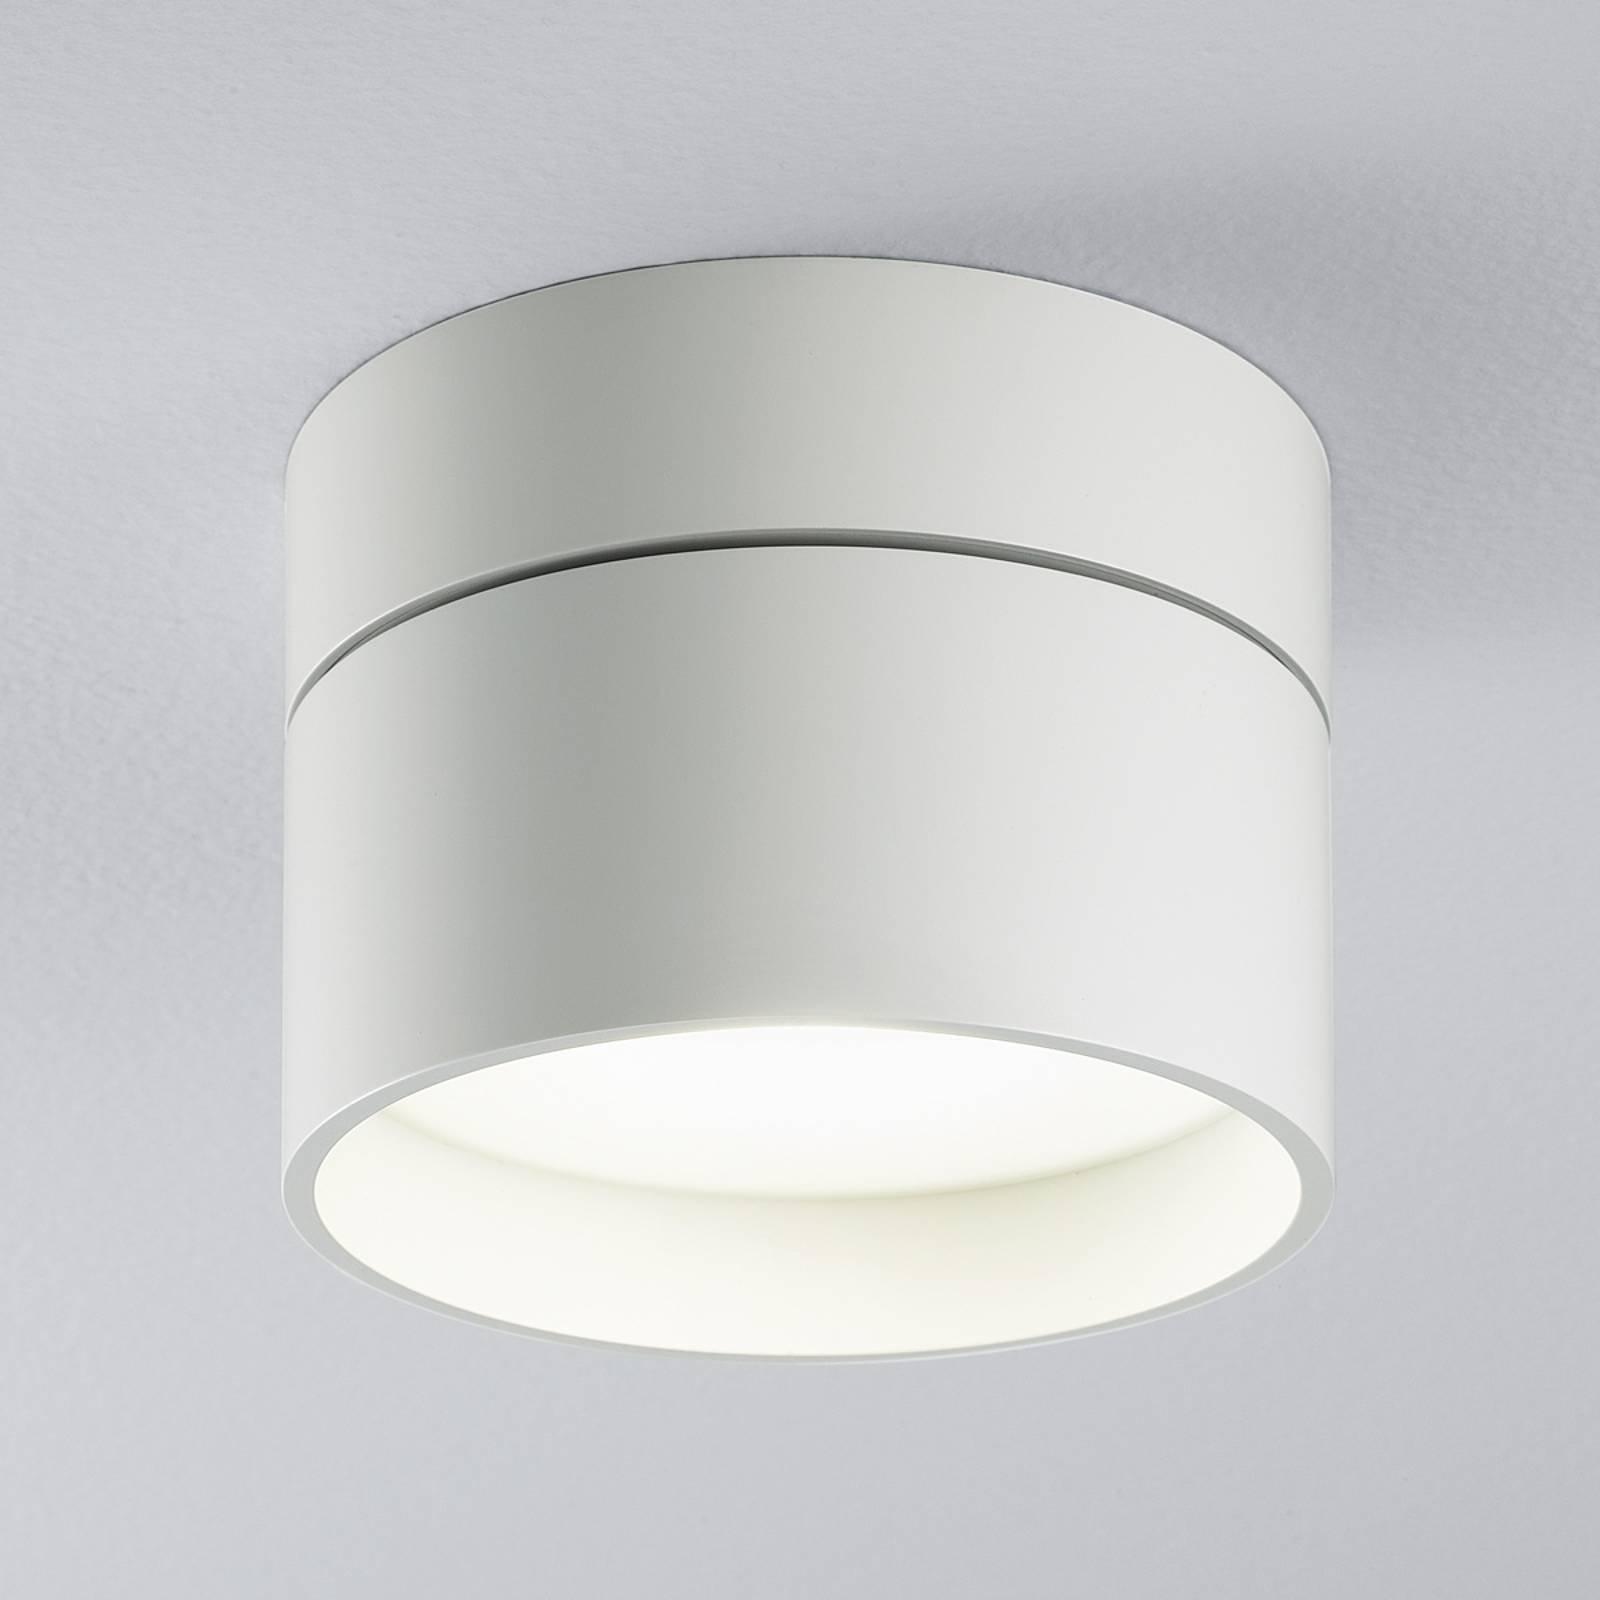 LED-taklampe Piper, 11 cm